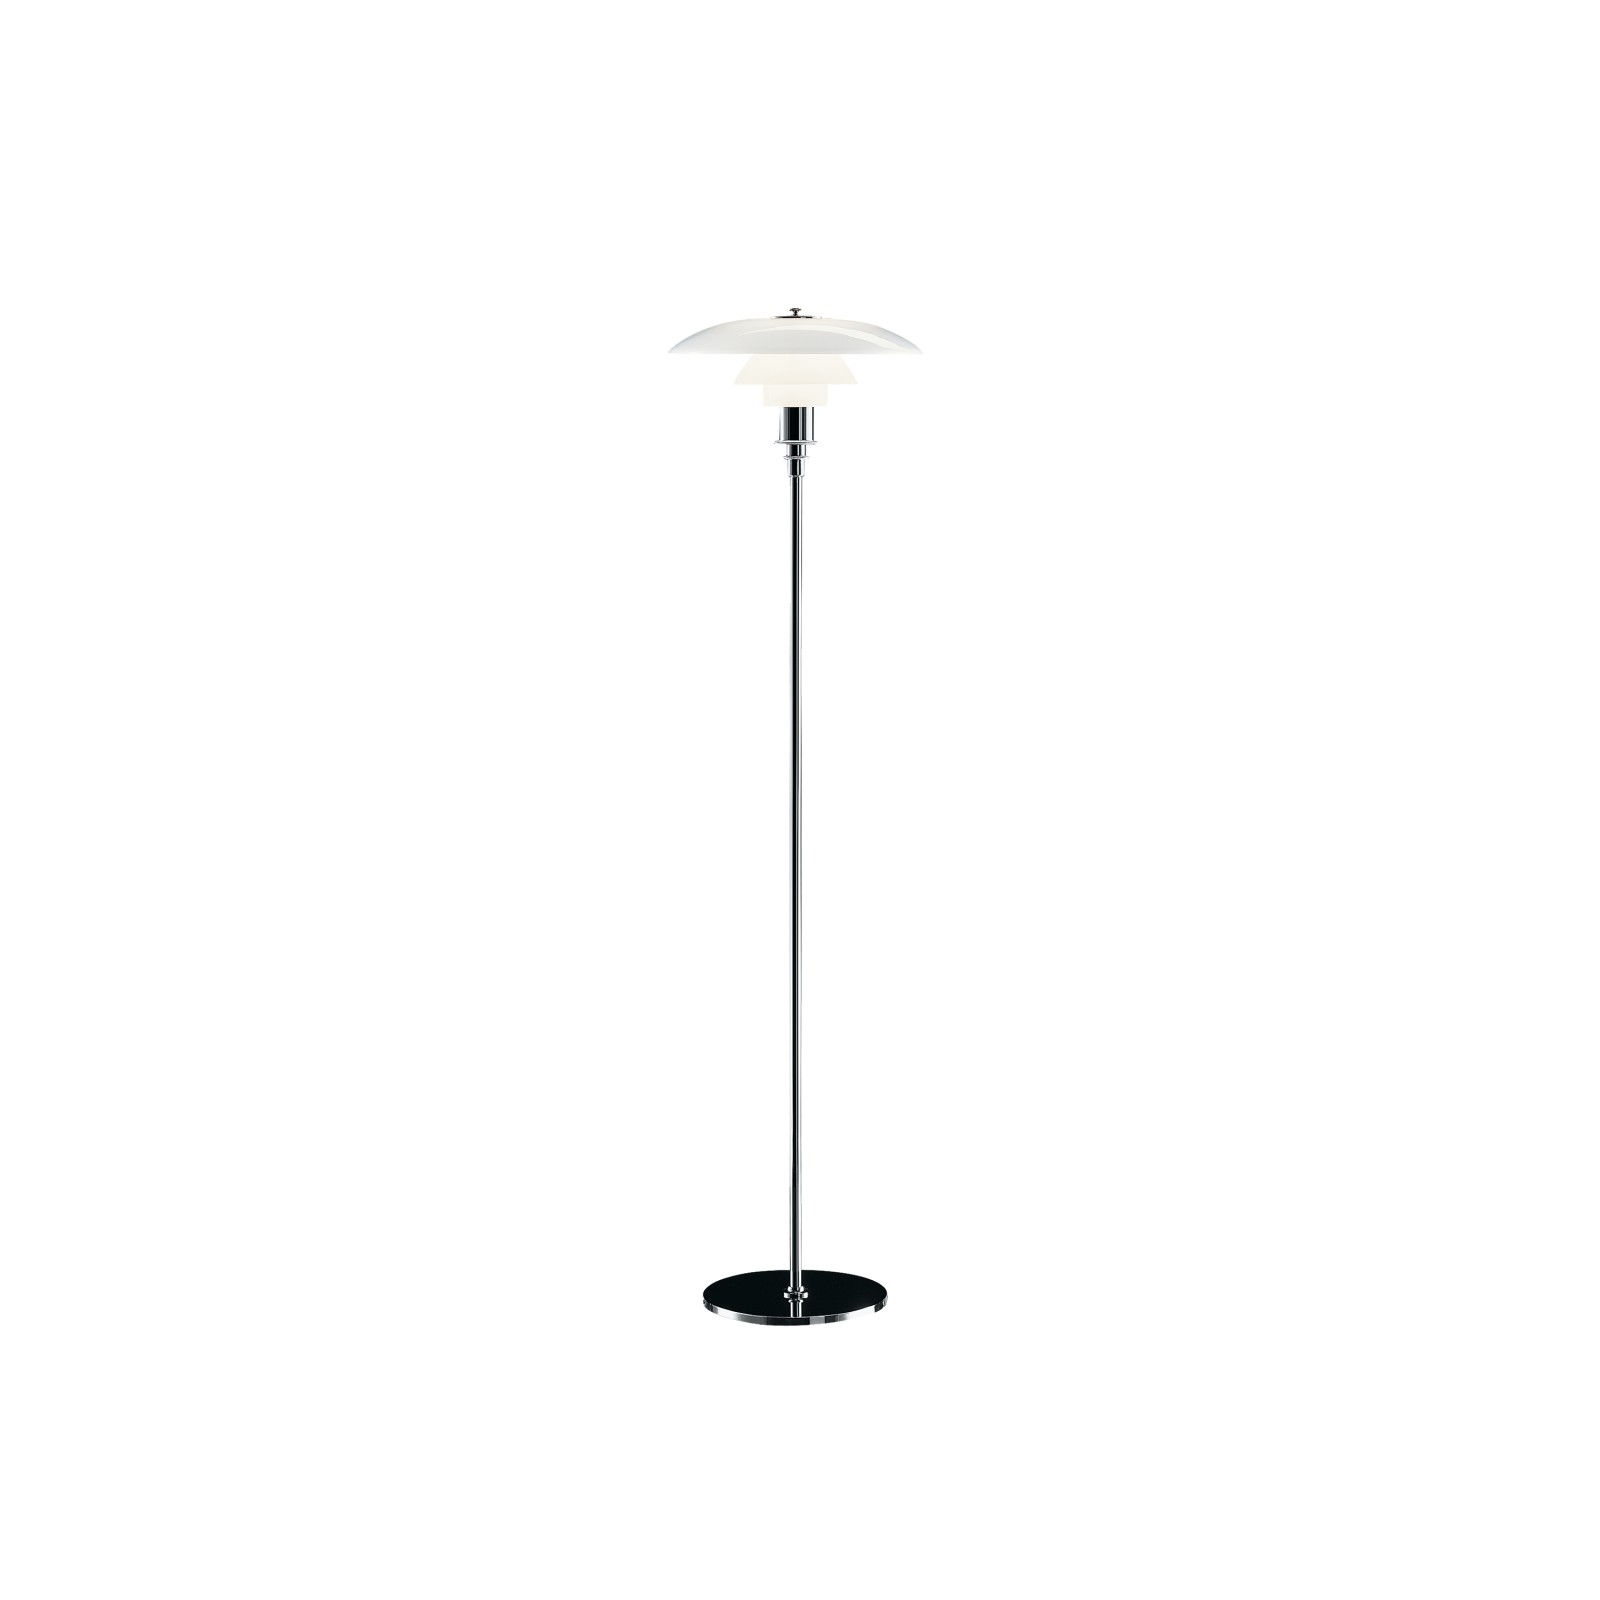 PH 3½-2½ Floor Lamp UK Plug, High Lustre Chrome Plated